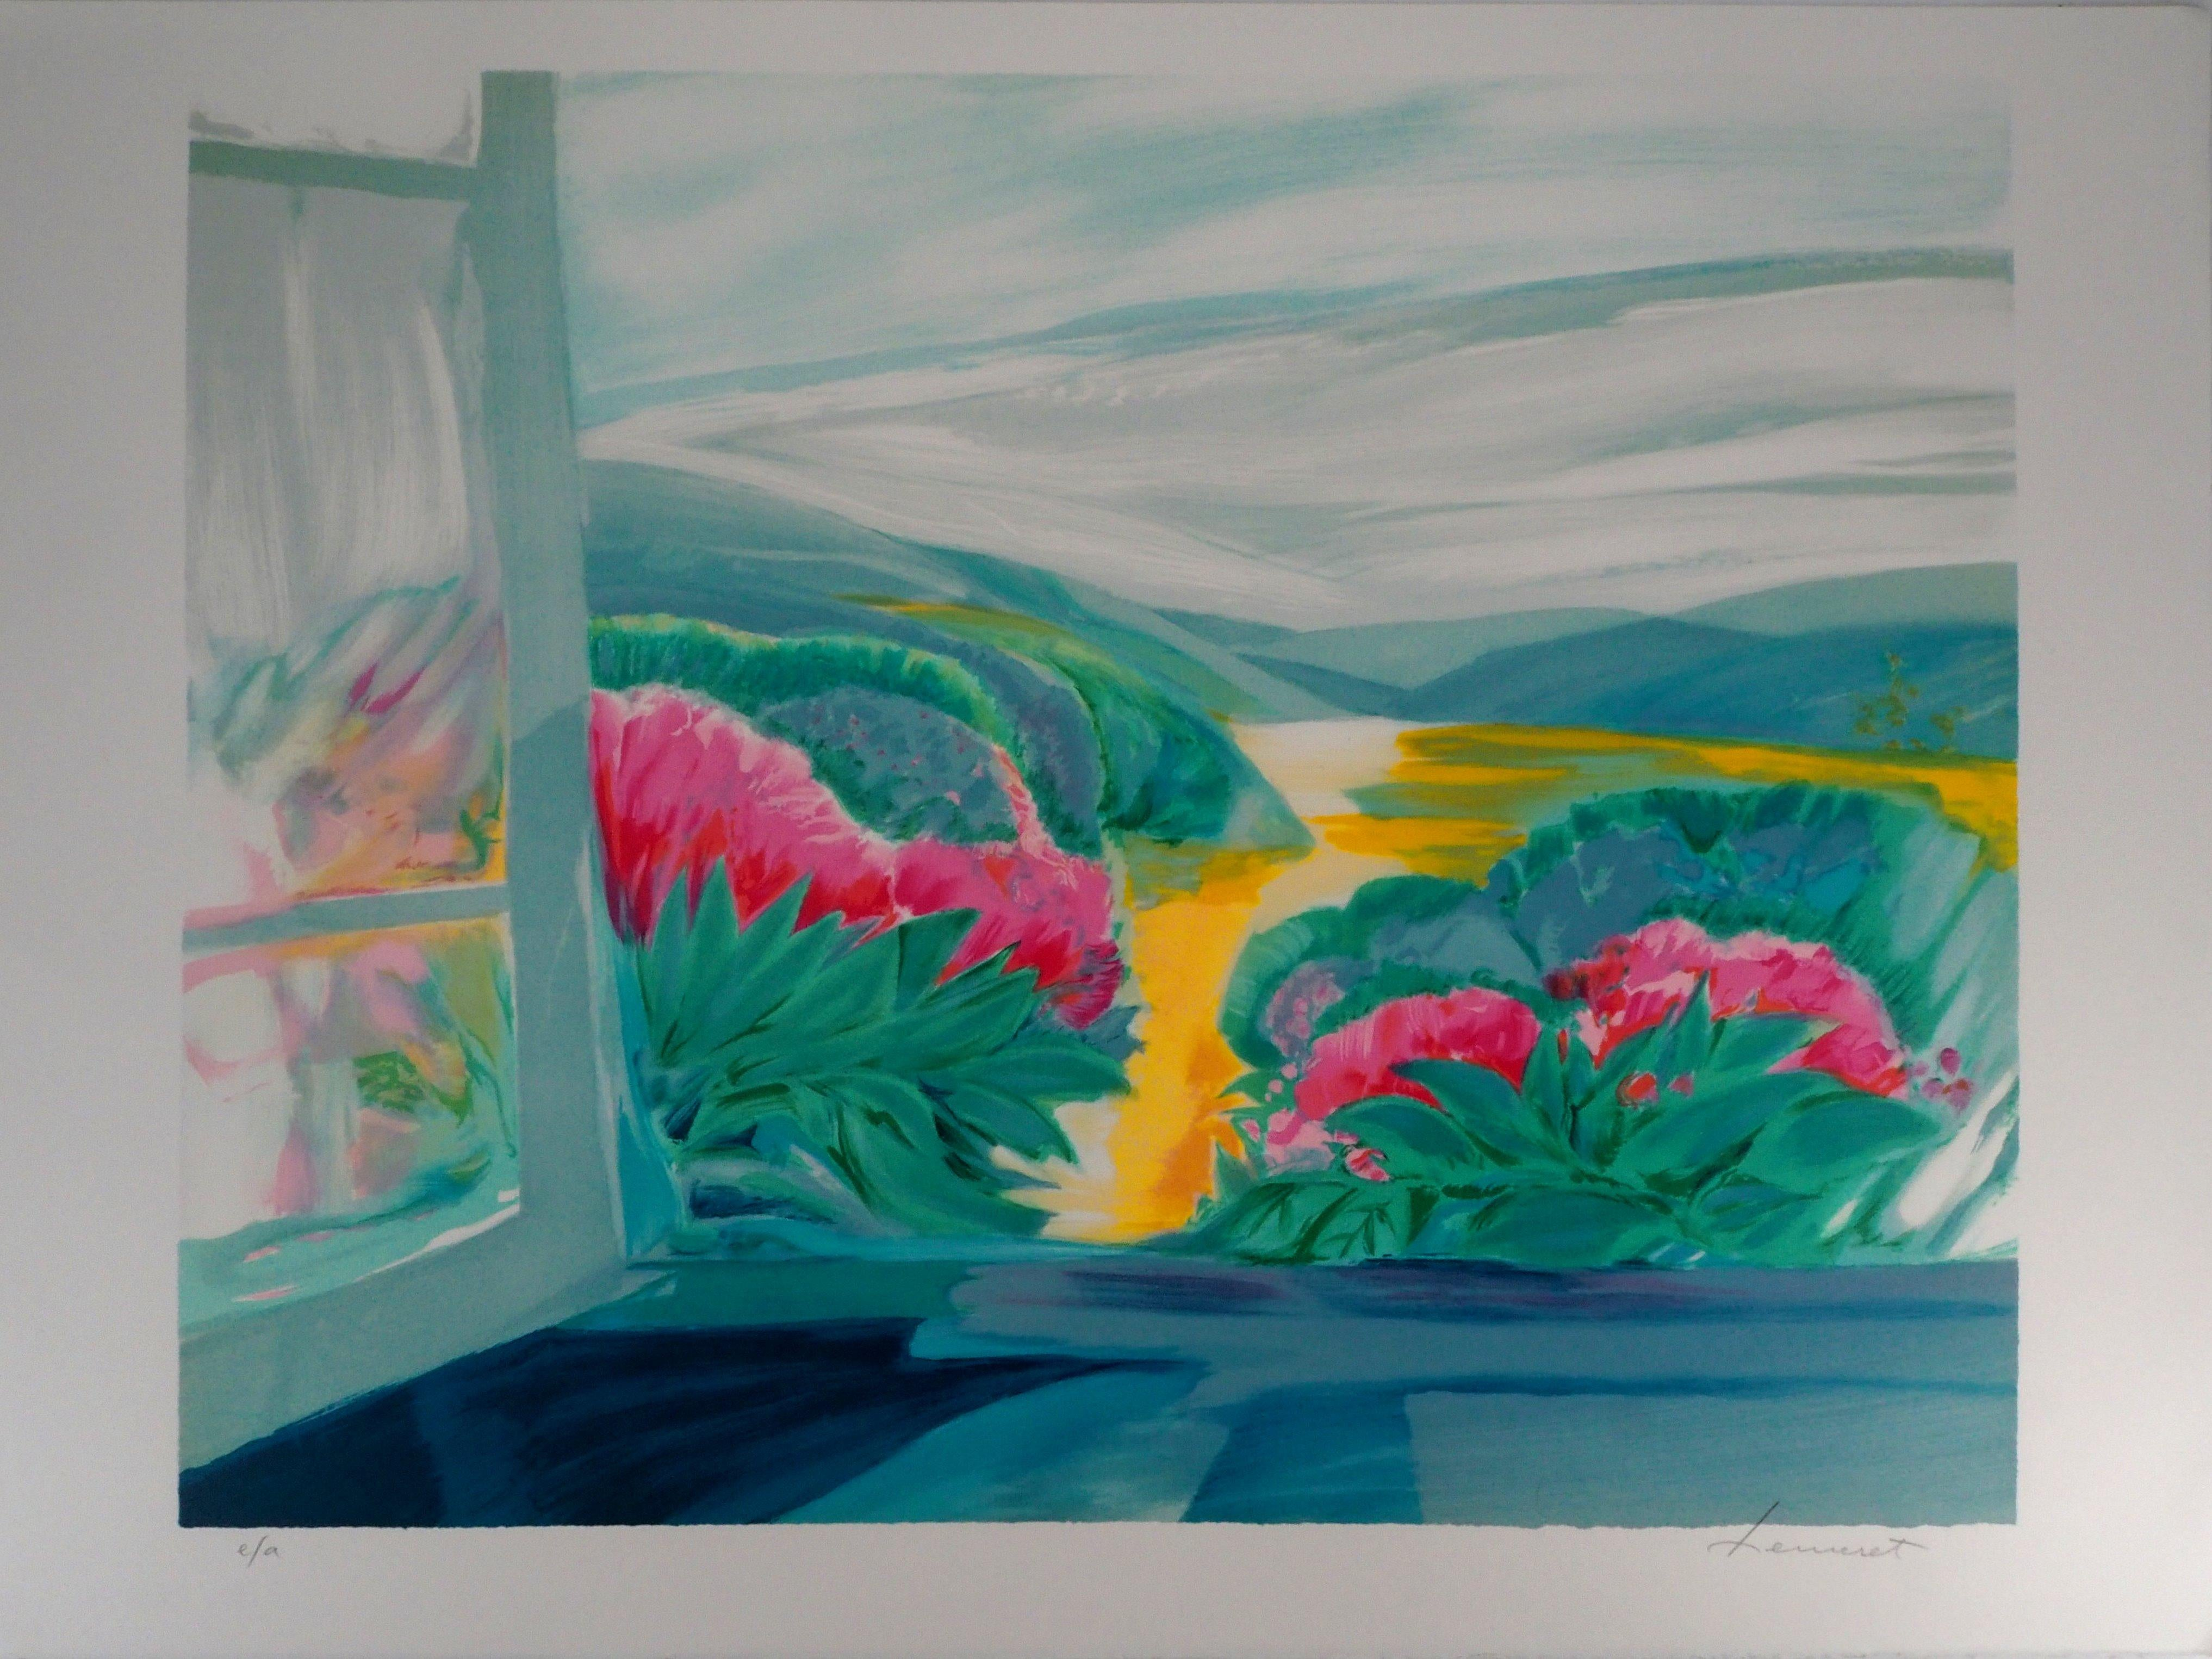 Spring, the Flower Valley -  Original Lithograph, Handsigned